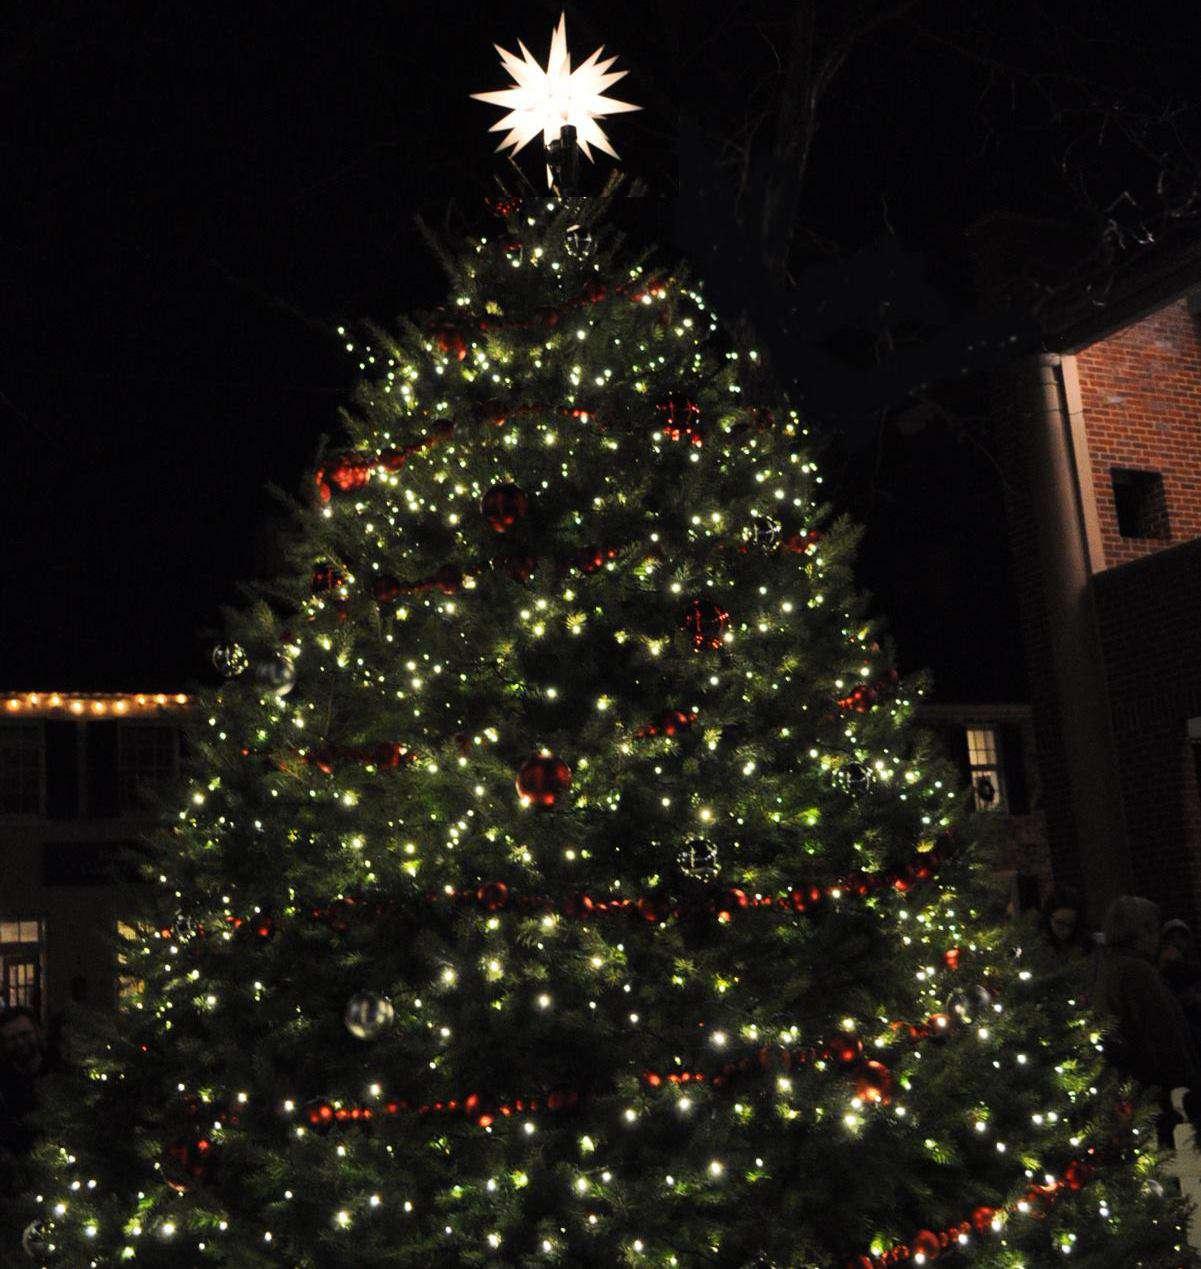 Tree lighting ceremony in the town of leesburg, VA